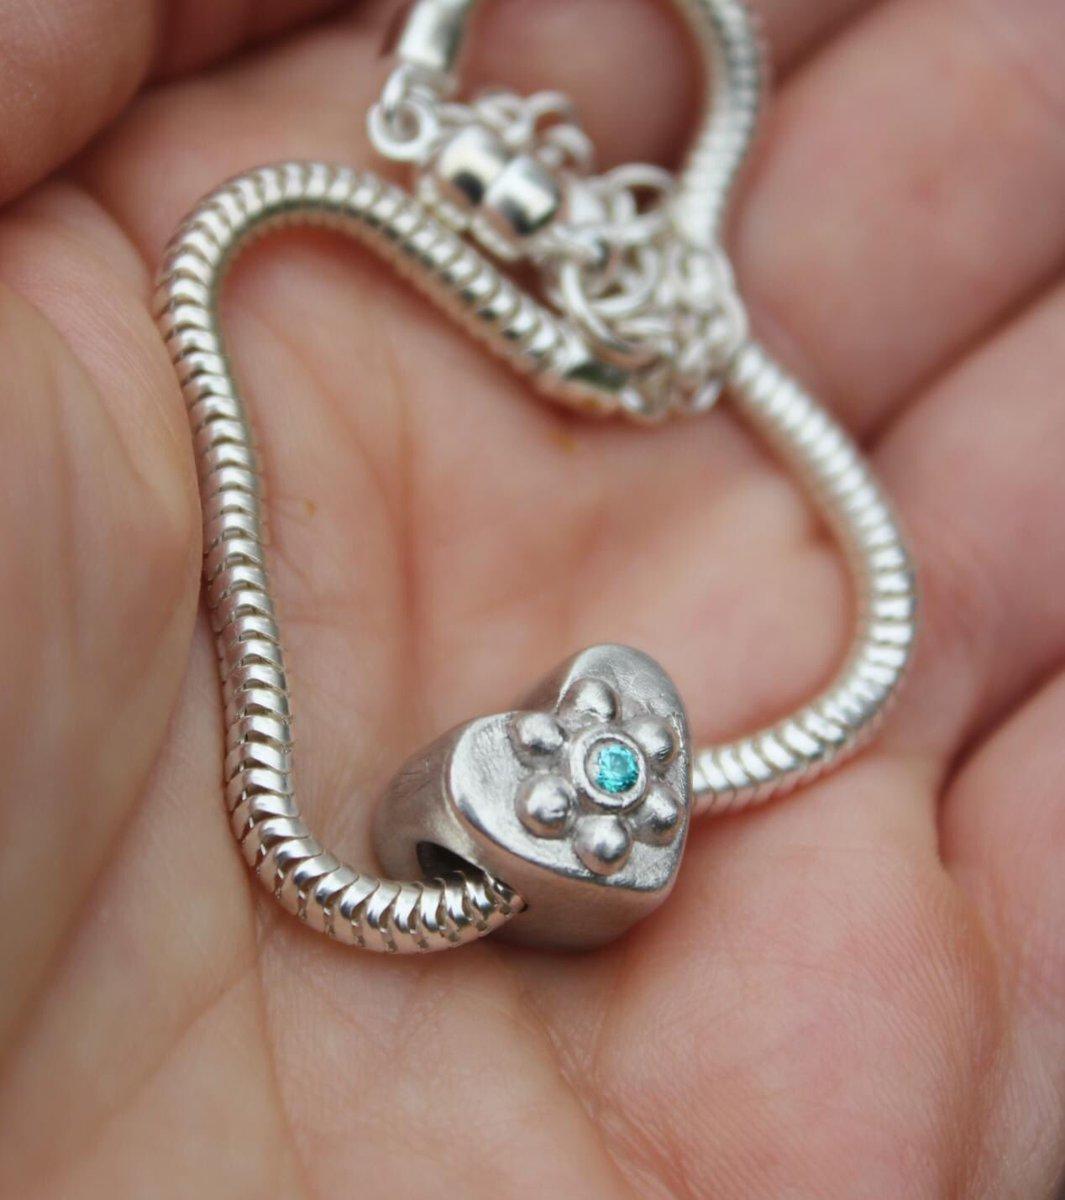 Thrilled with my first handmade pandora charm bead ❤️